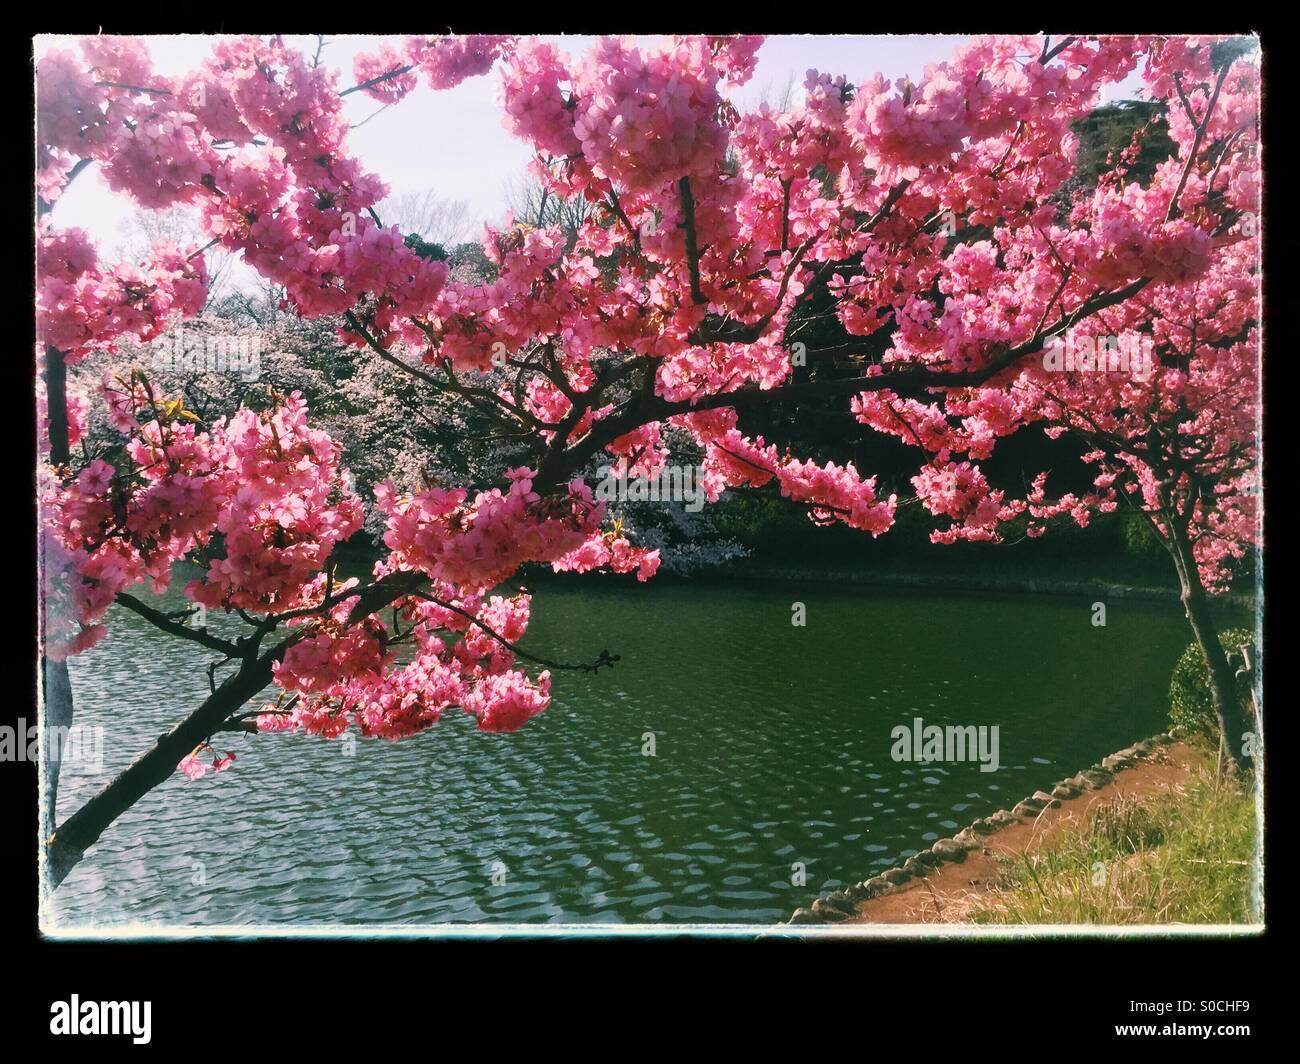 Pond with Yokohamahizakura, a variety of Sakura or cherry blossom with deep pink color. Black vintage frame. - Stock Image